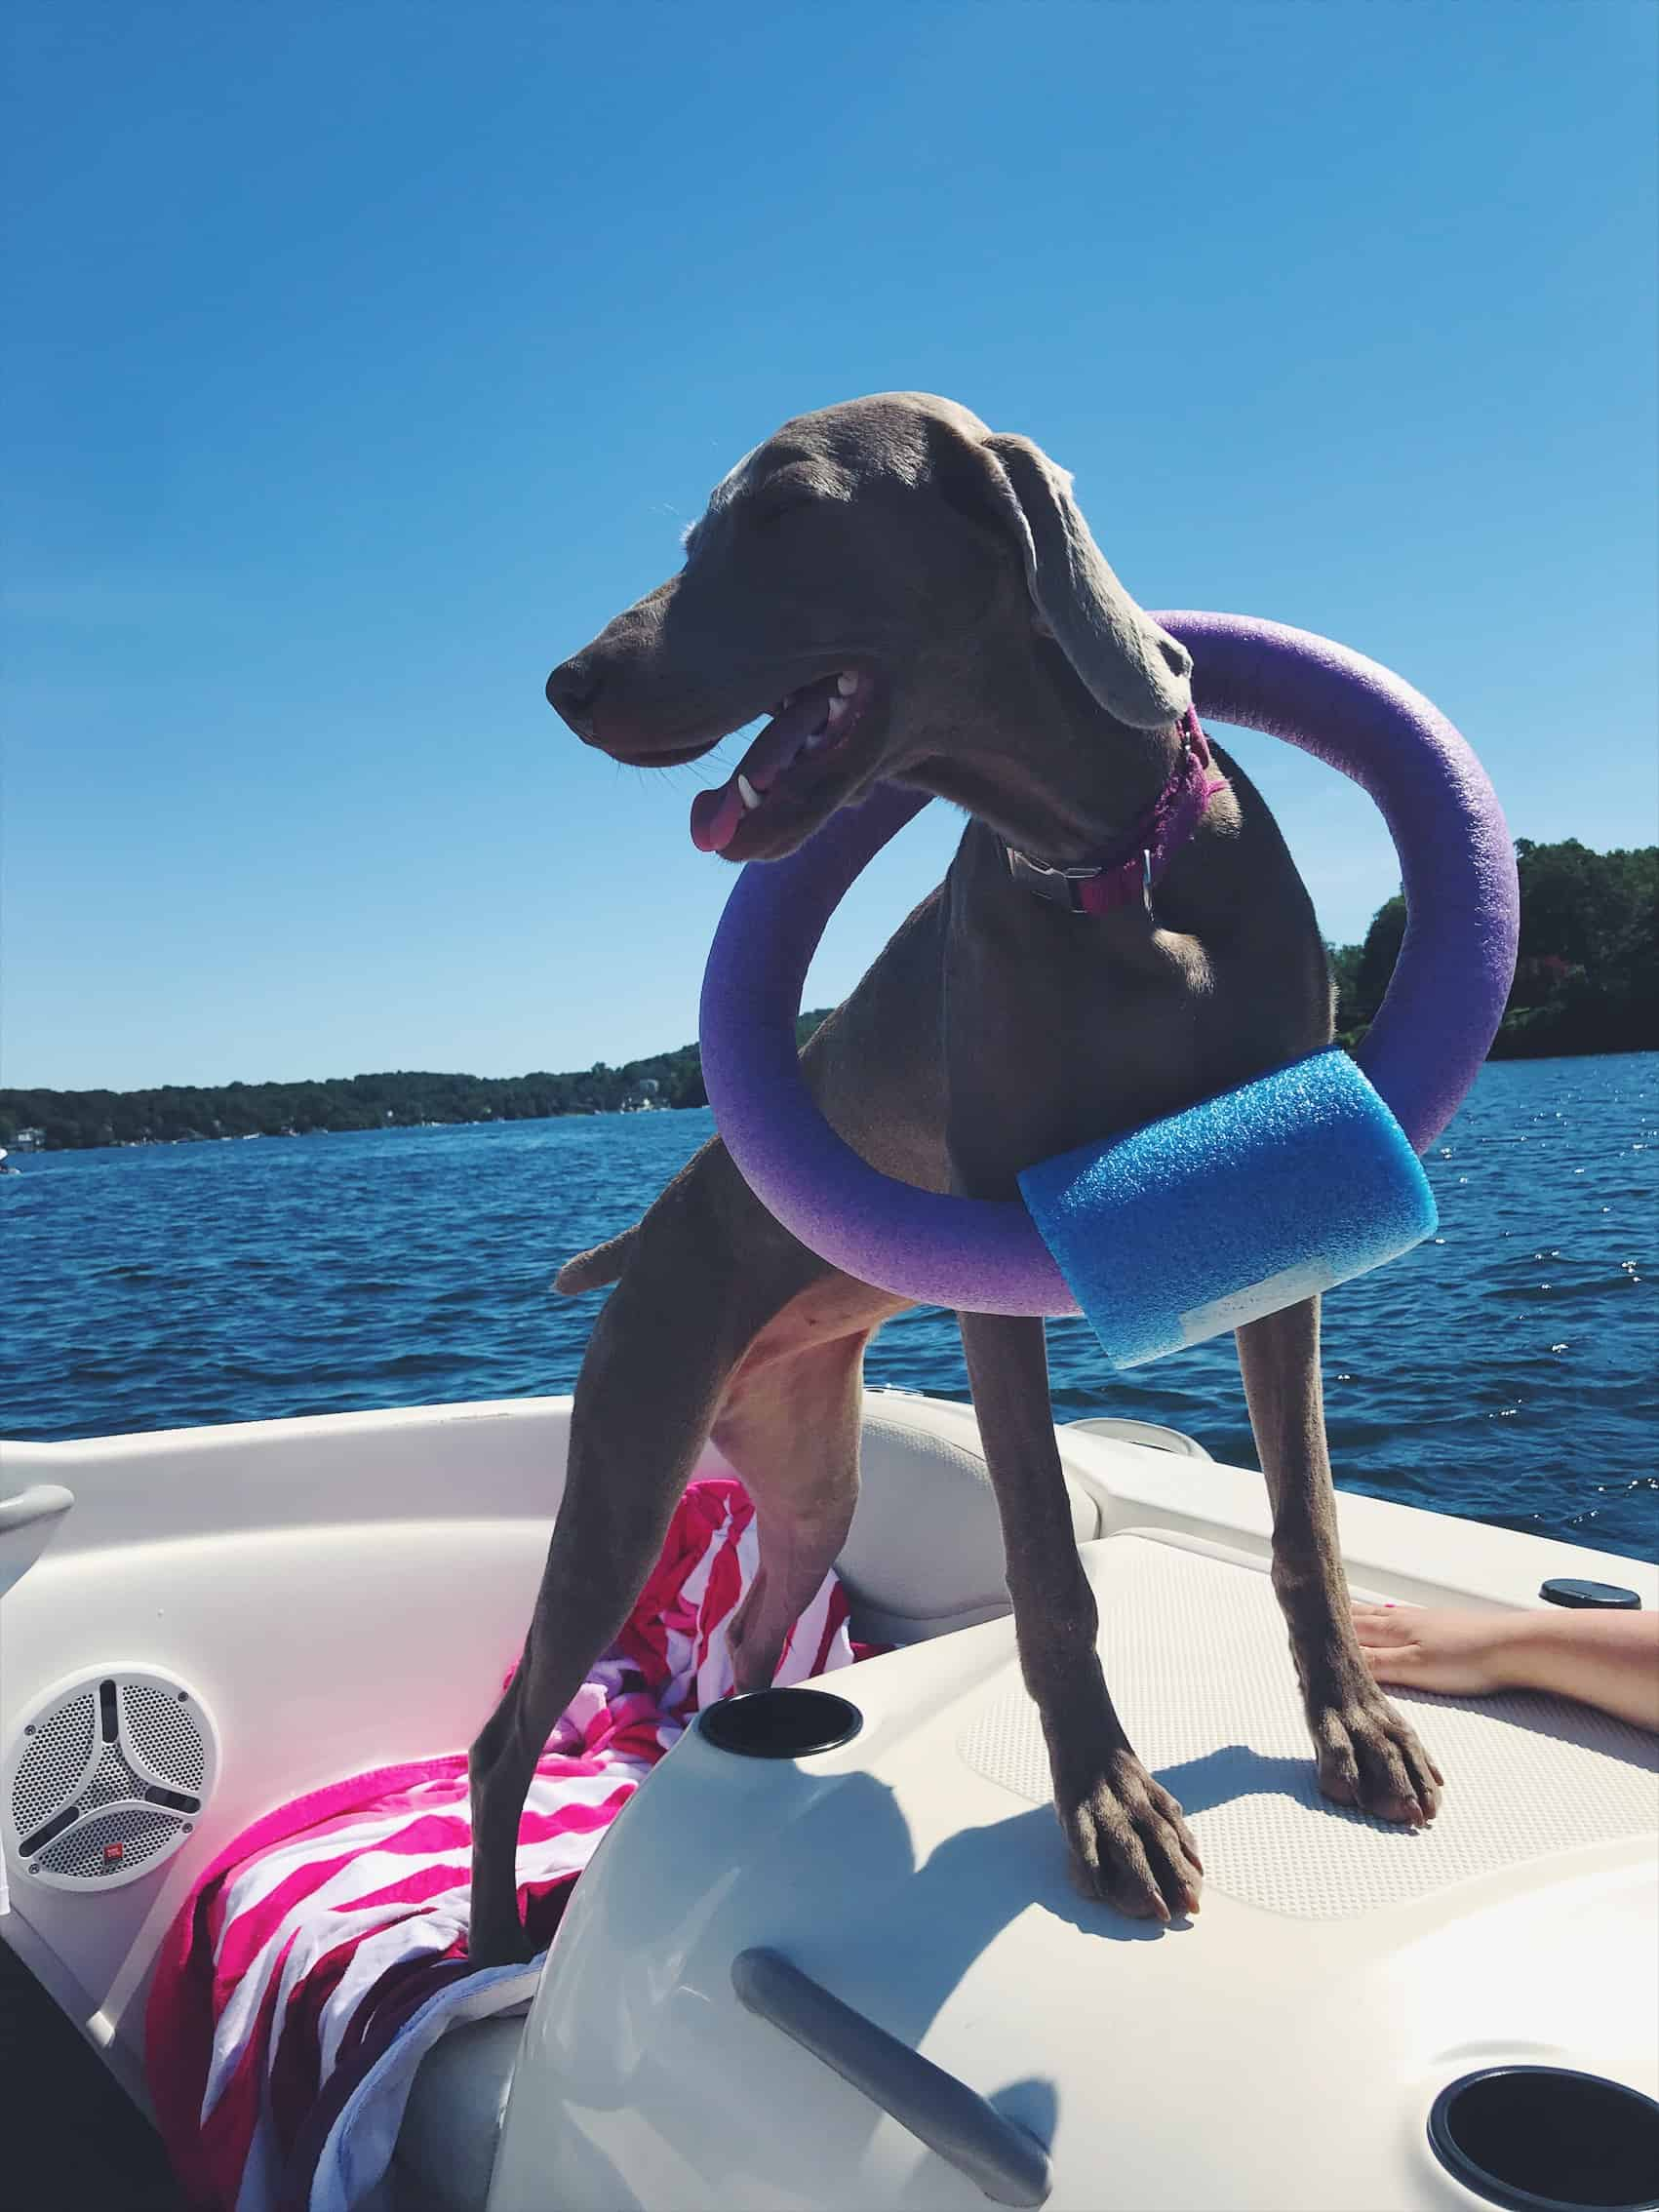 Lake Mahopac, NY and Weimaraner puppy on boat